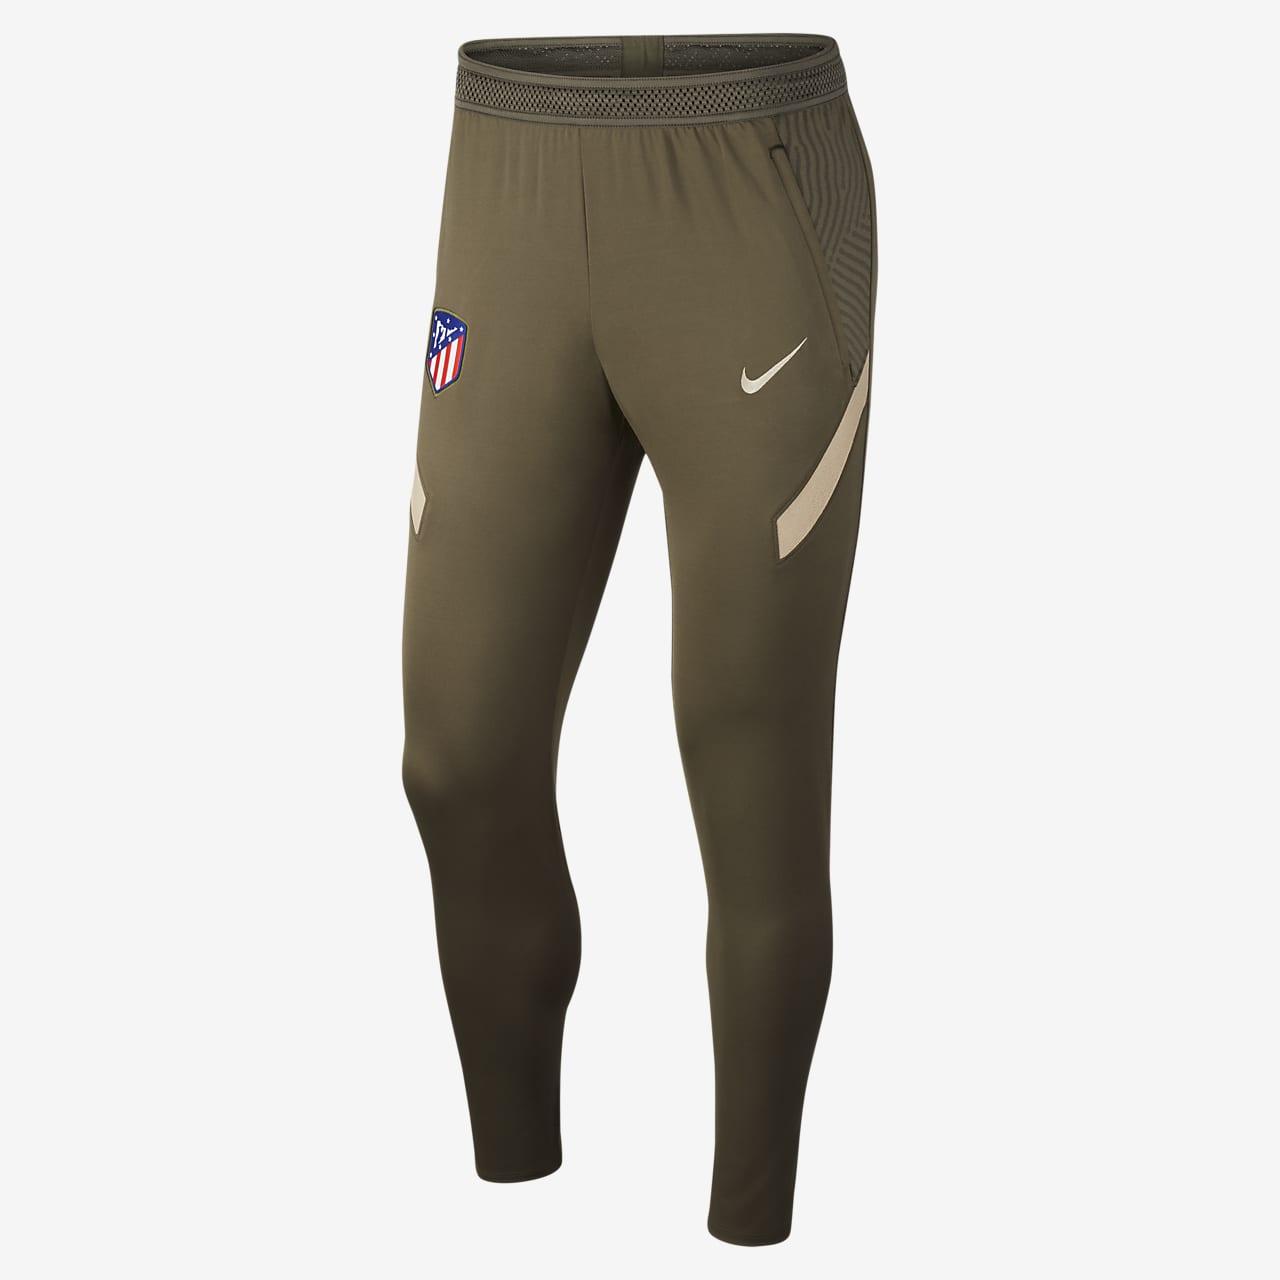 Atlético de Madrid Strike Men's Football Pants